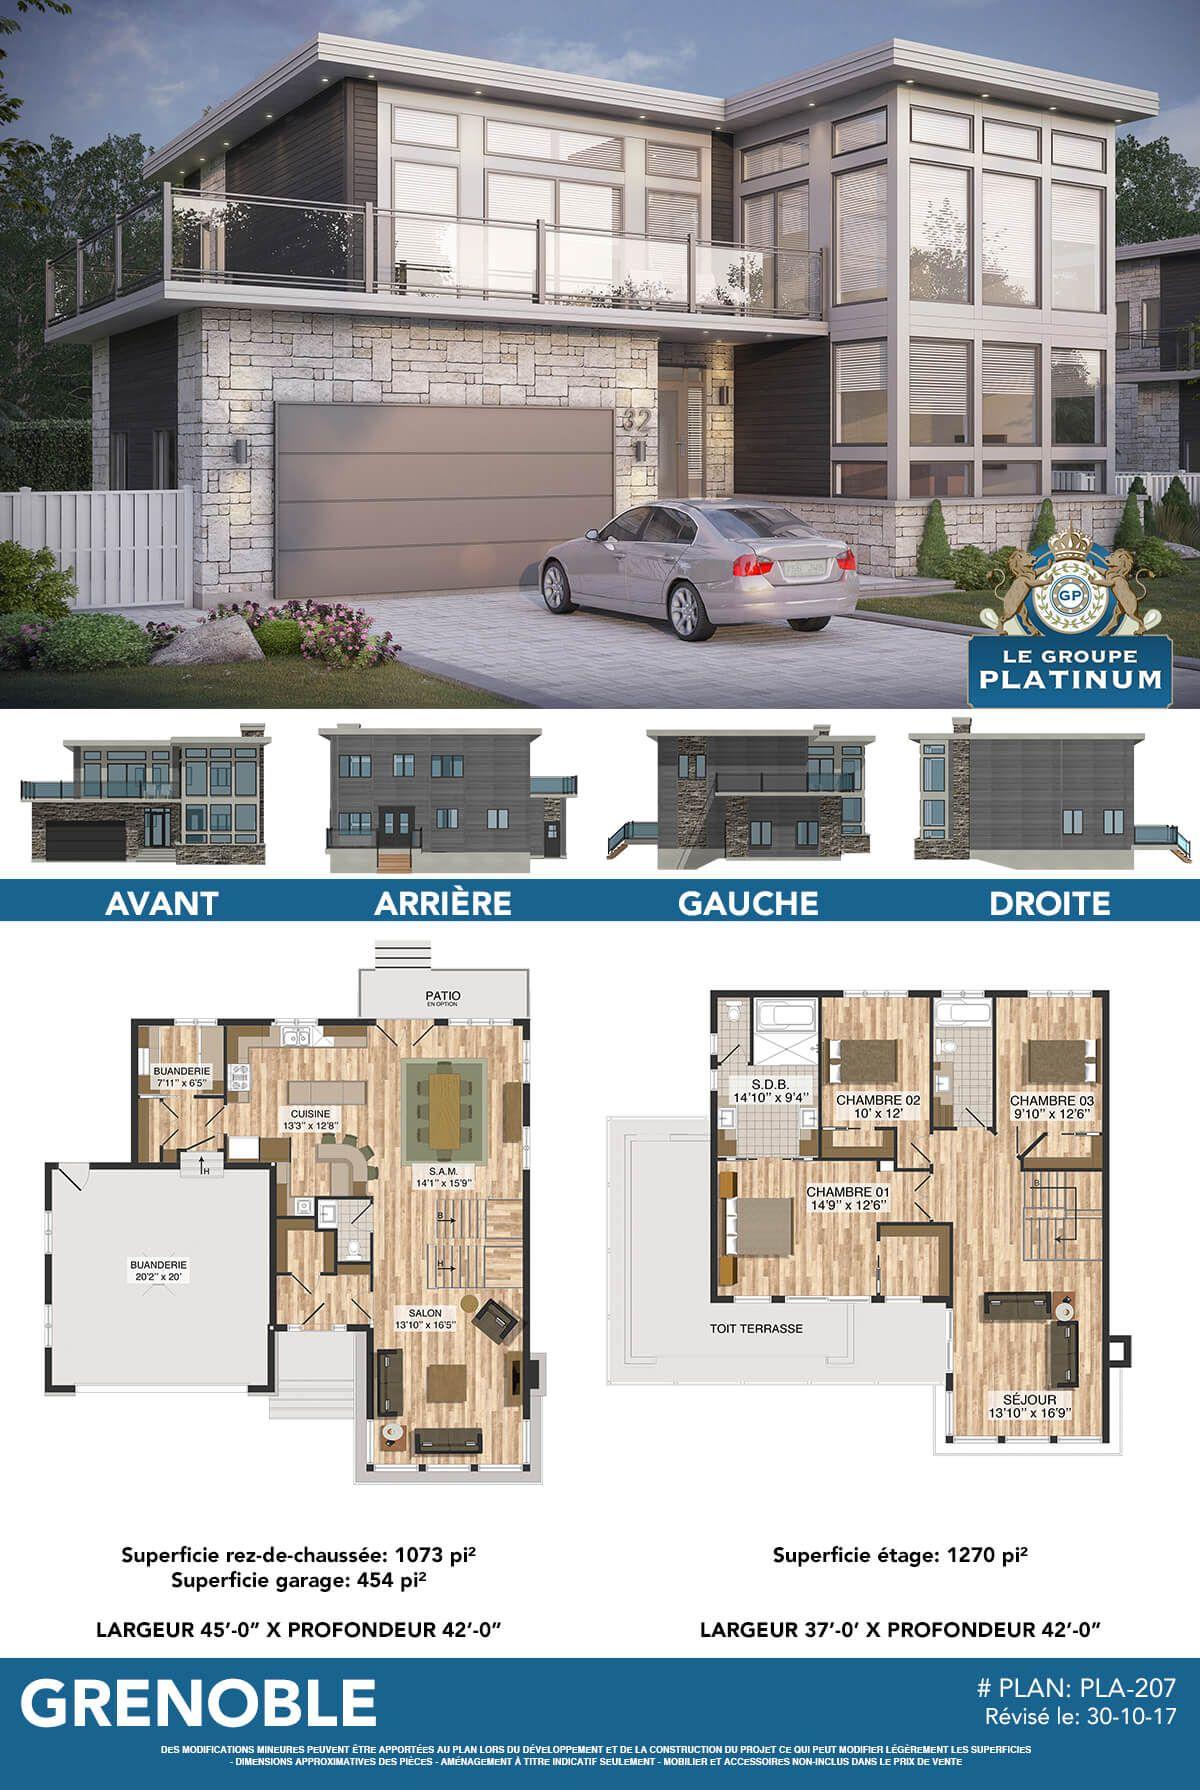 le grenoble maisons neuves vendre blainville le groupe platinum home decor in 2019. Black Bedroom Furniture Sets. Home Design Ideas